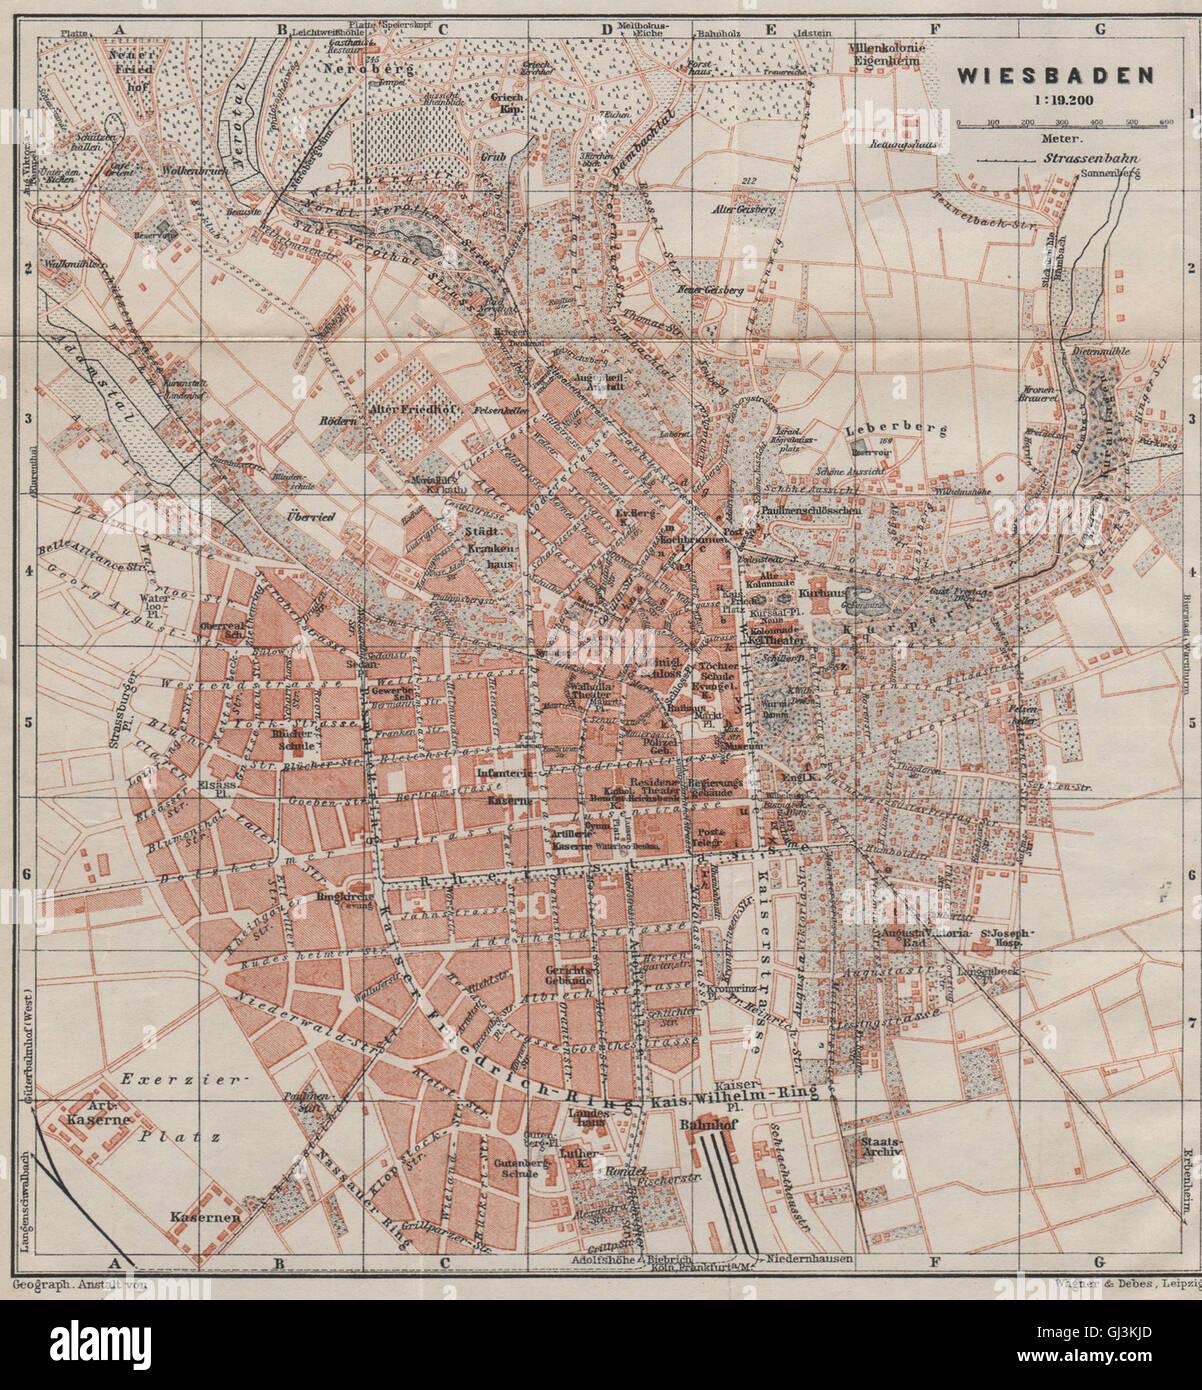 Wiesbaden Karte.Wiesbaden Antique Town City Stadtplan Hessen Karte Baedeker 1906